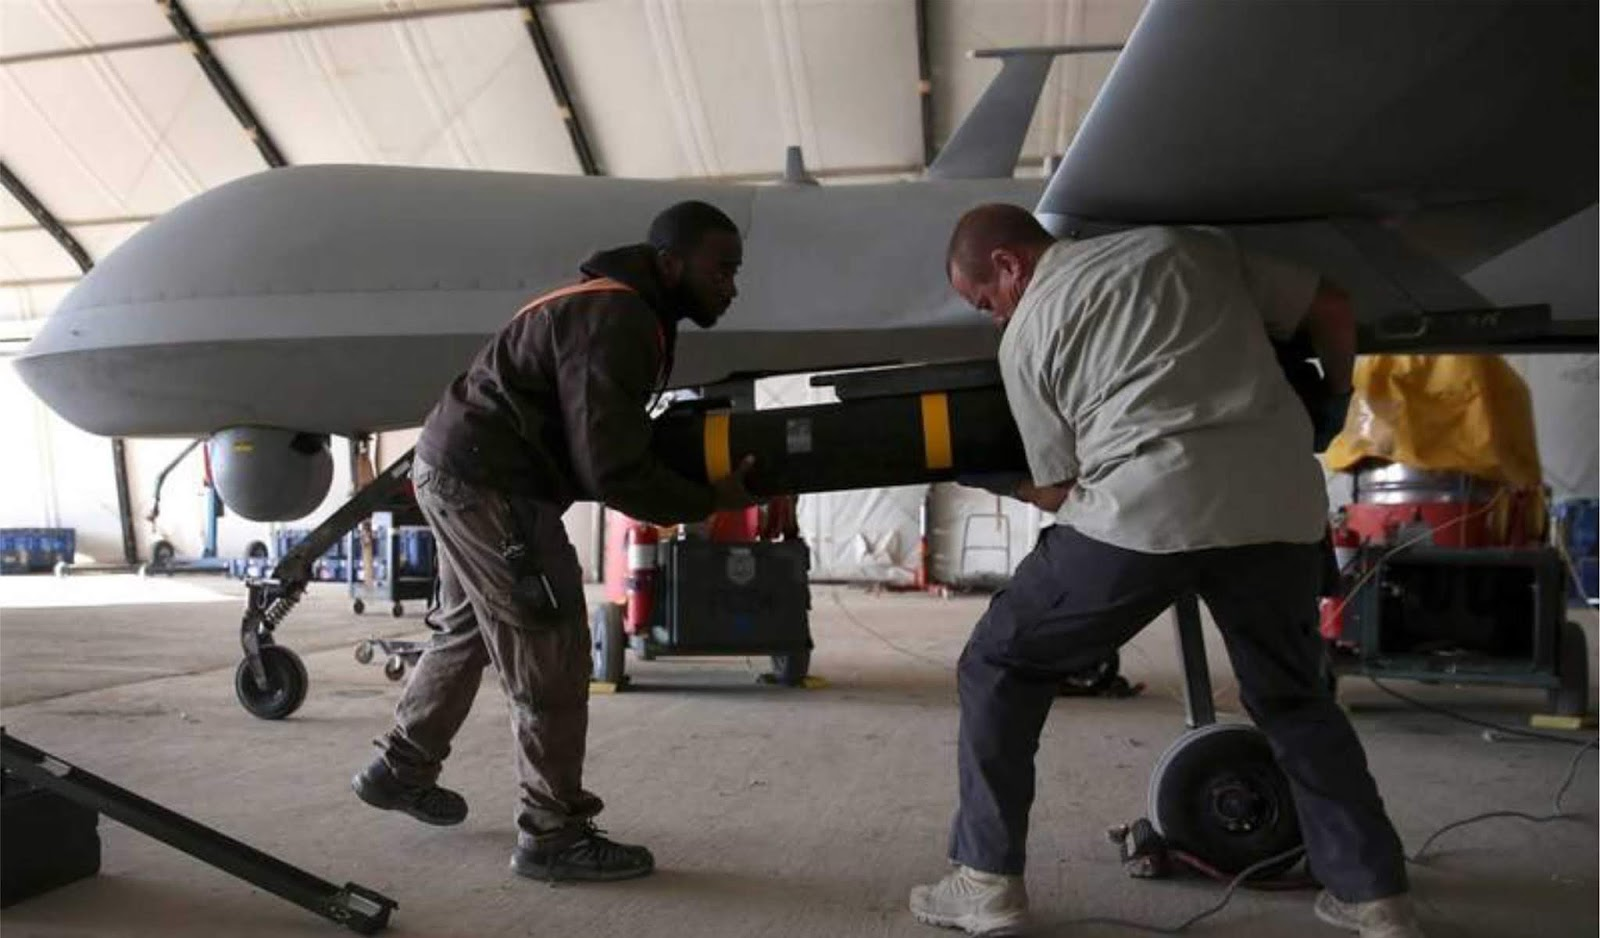 Trump telah mengizinkan CIA untuk tidak melaporkan korban sipil akibat serangan UAV